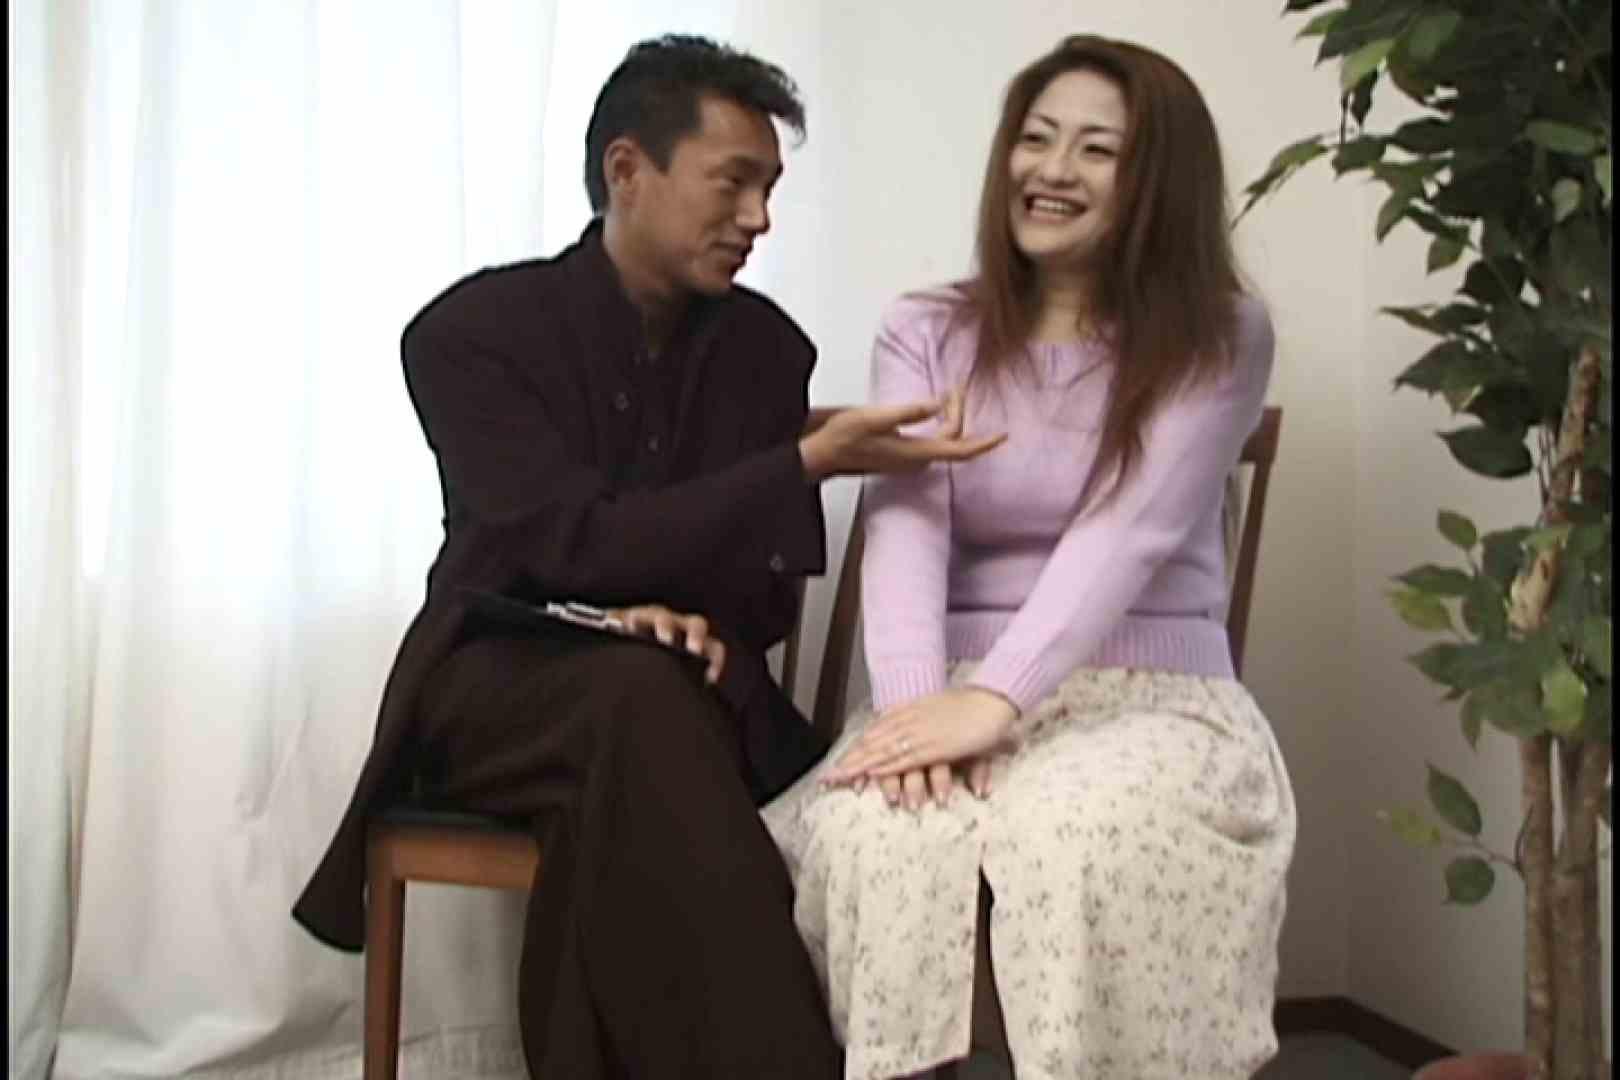 昼間の奥様は欲求不満 ~青井祐子~ 熟女  43連発 19